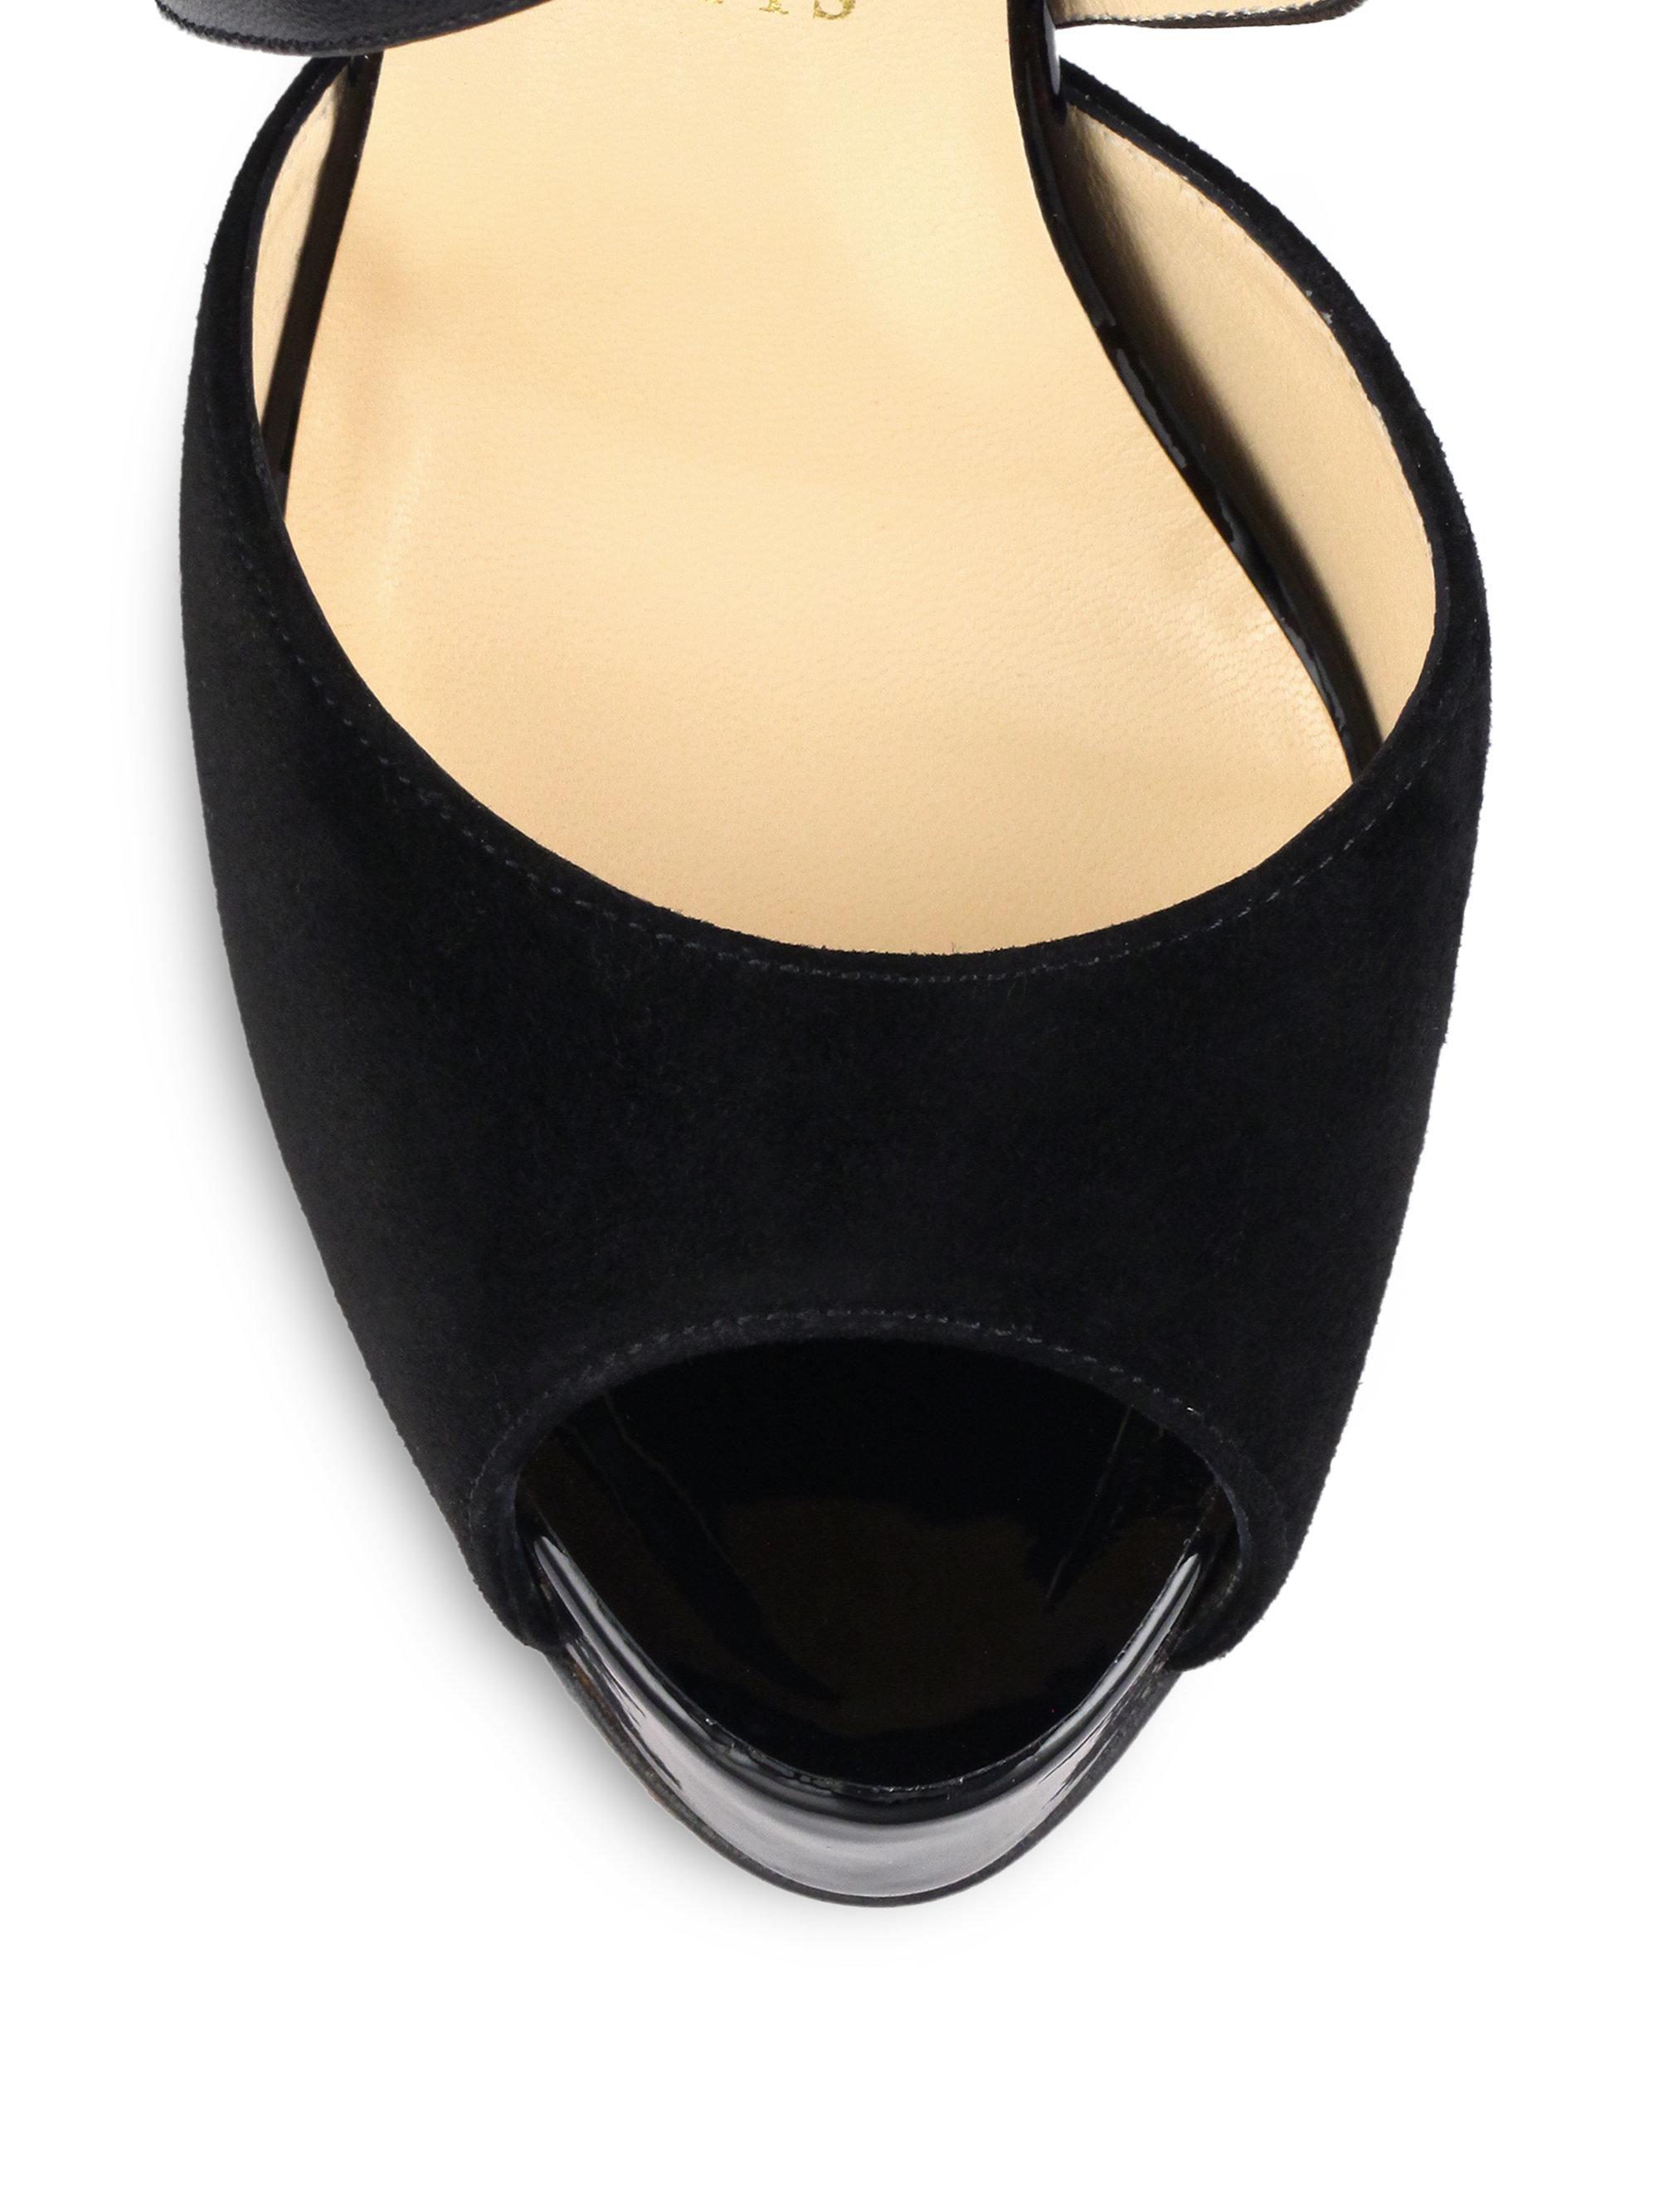 louboutin shoes - Christian louboutin Cross Minetta Suede & Python Platform Pumps in ...